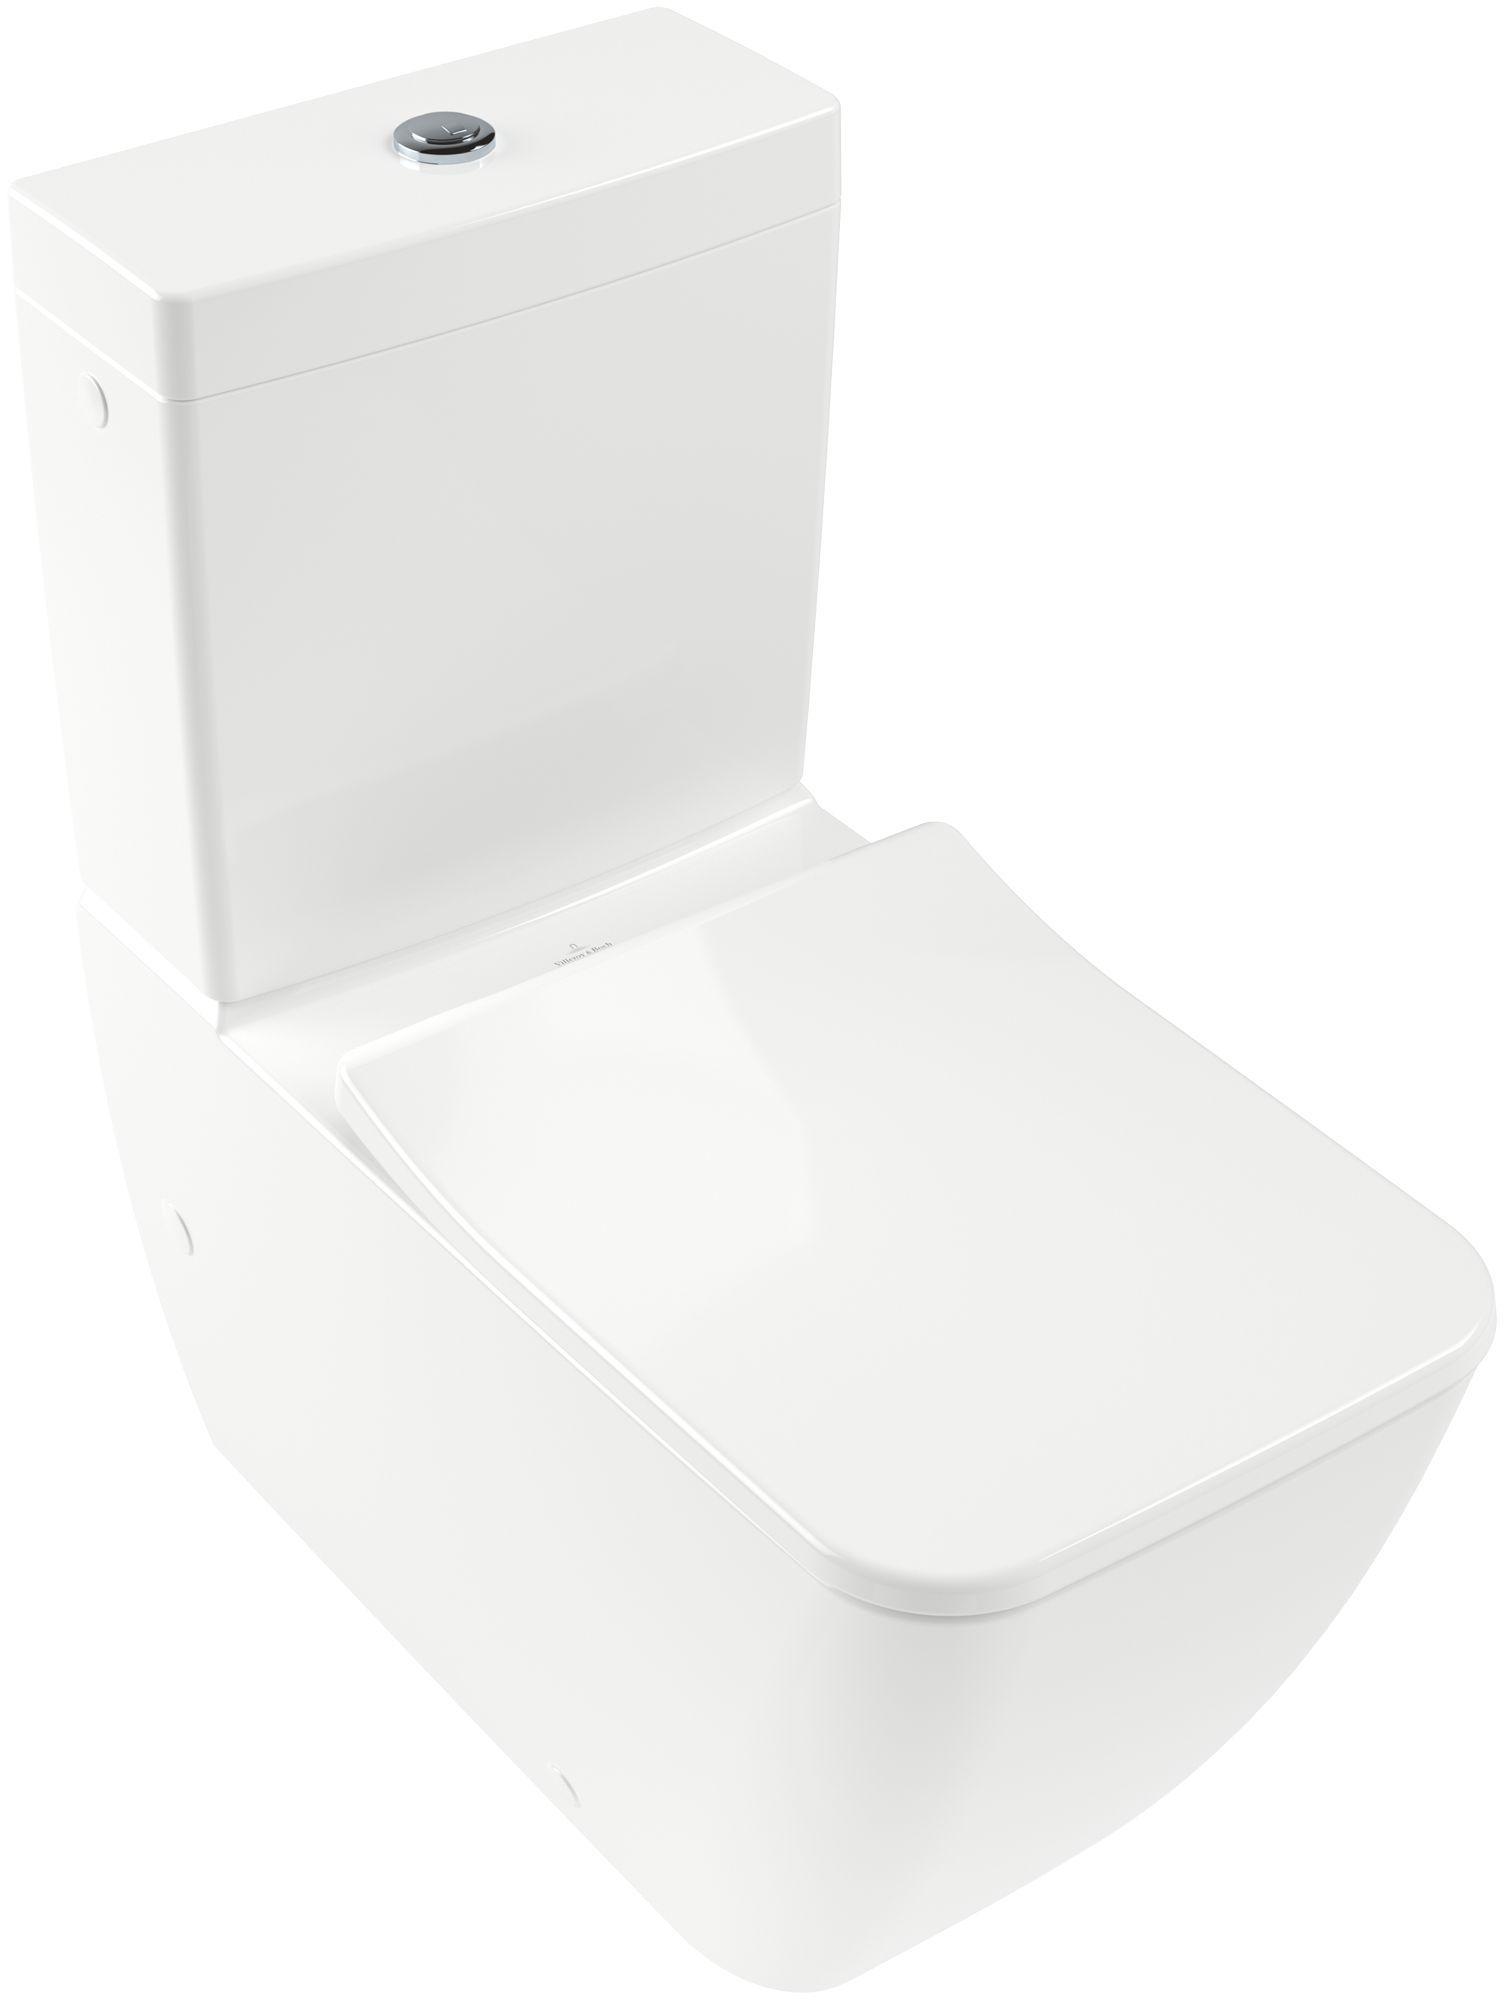 Villeroy & Boch Venticello Tiefspül-Stand-WC für Kombination spülrandlos DirectFlush B:37,5xL:70cm weiß 4612R001